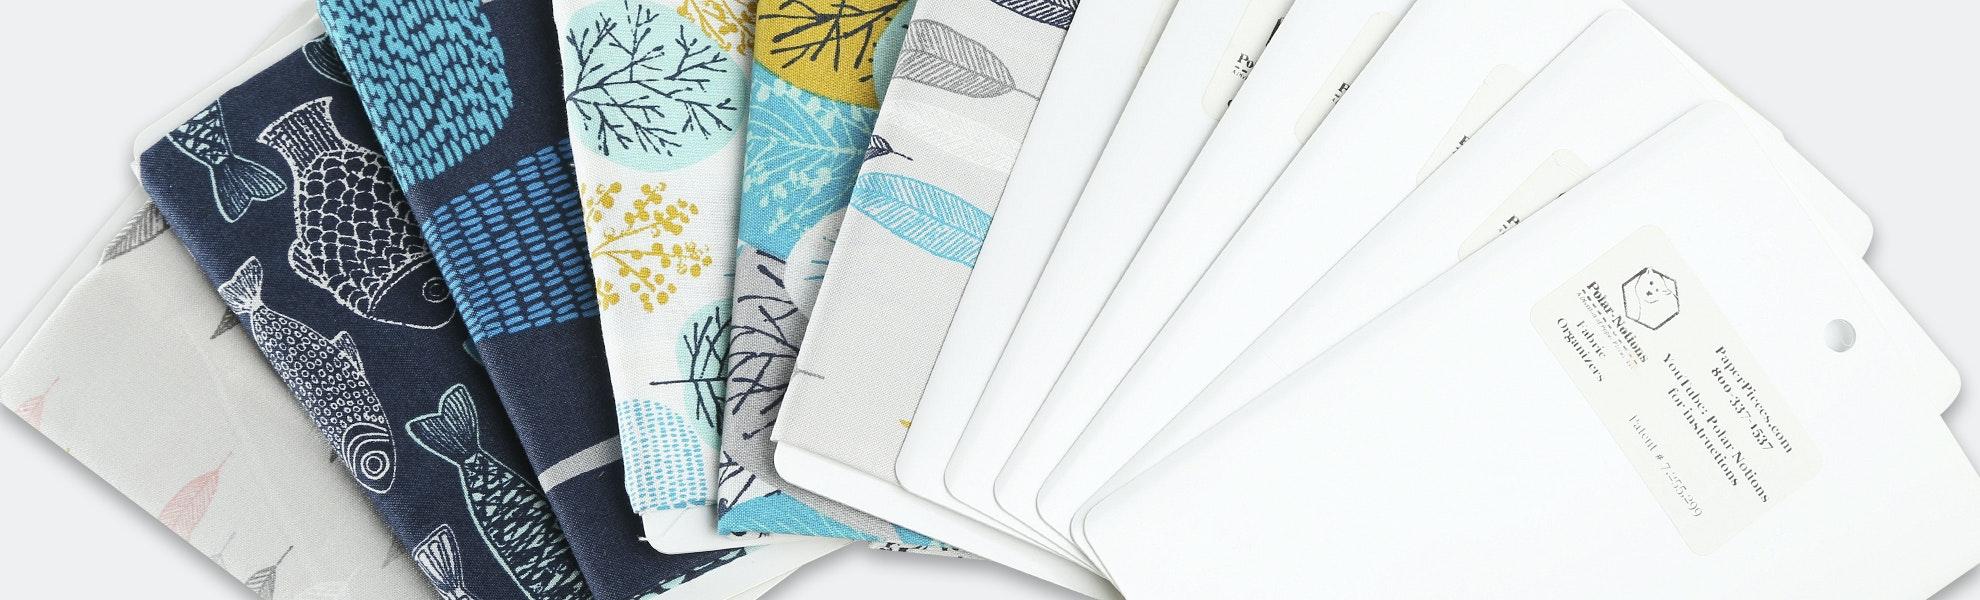 Polar Notions Fabric Organizers